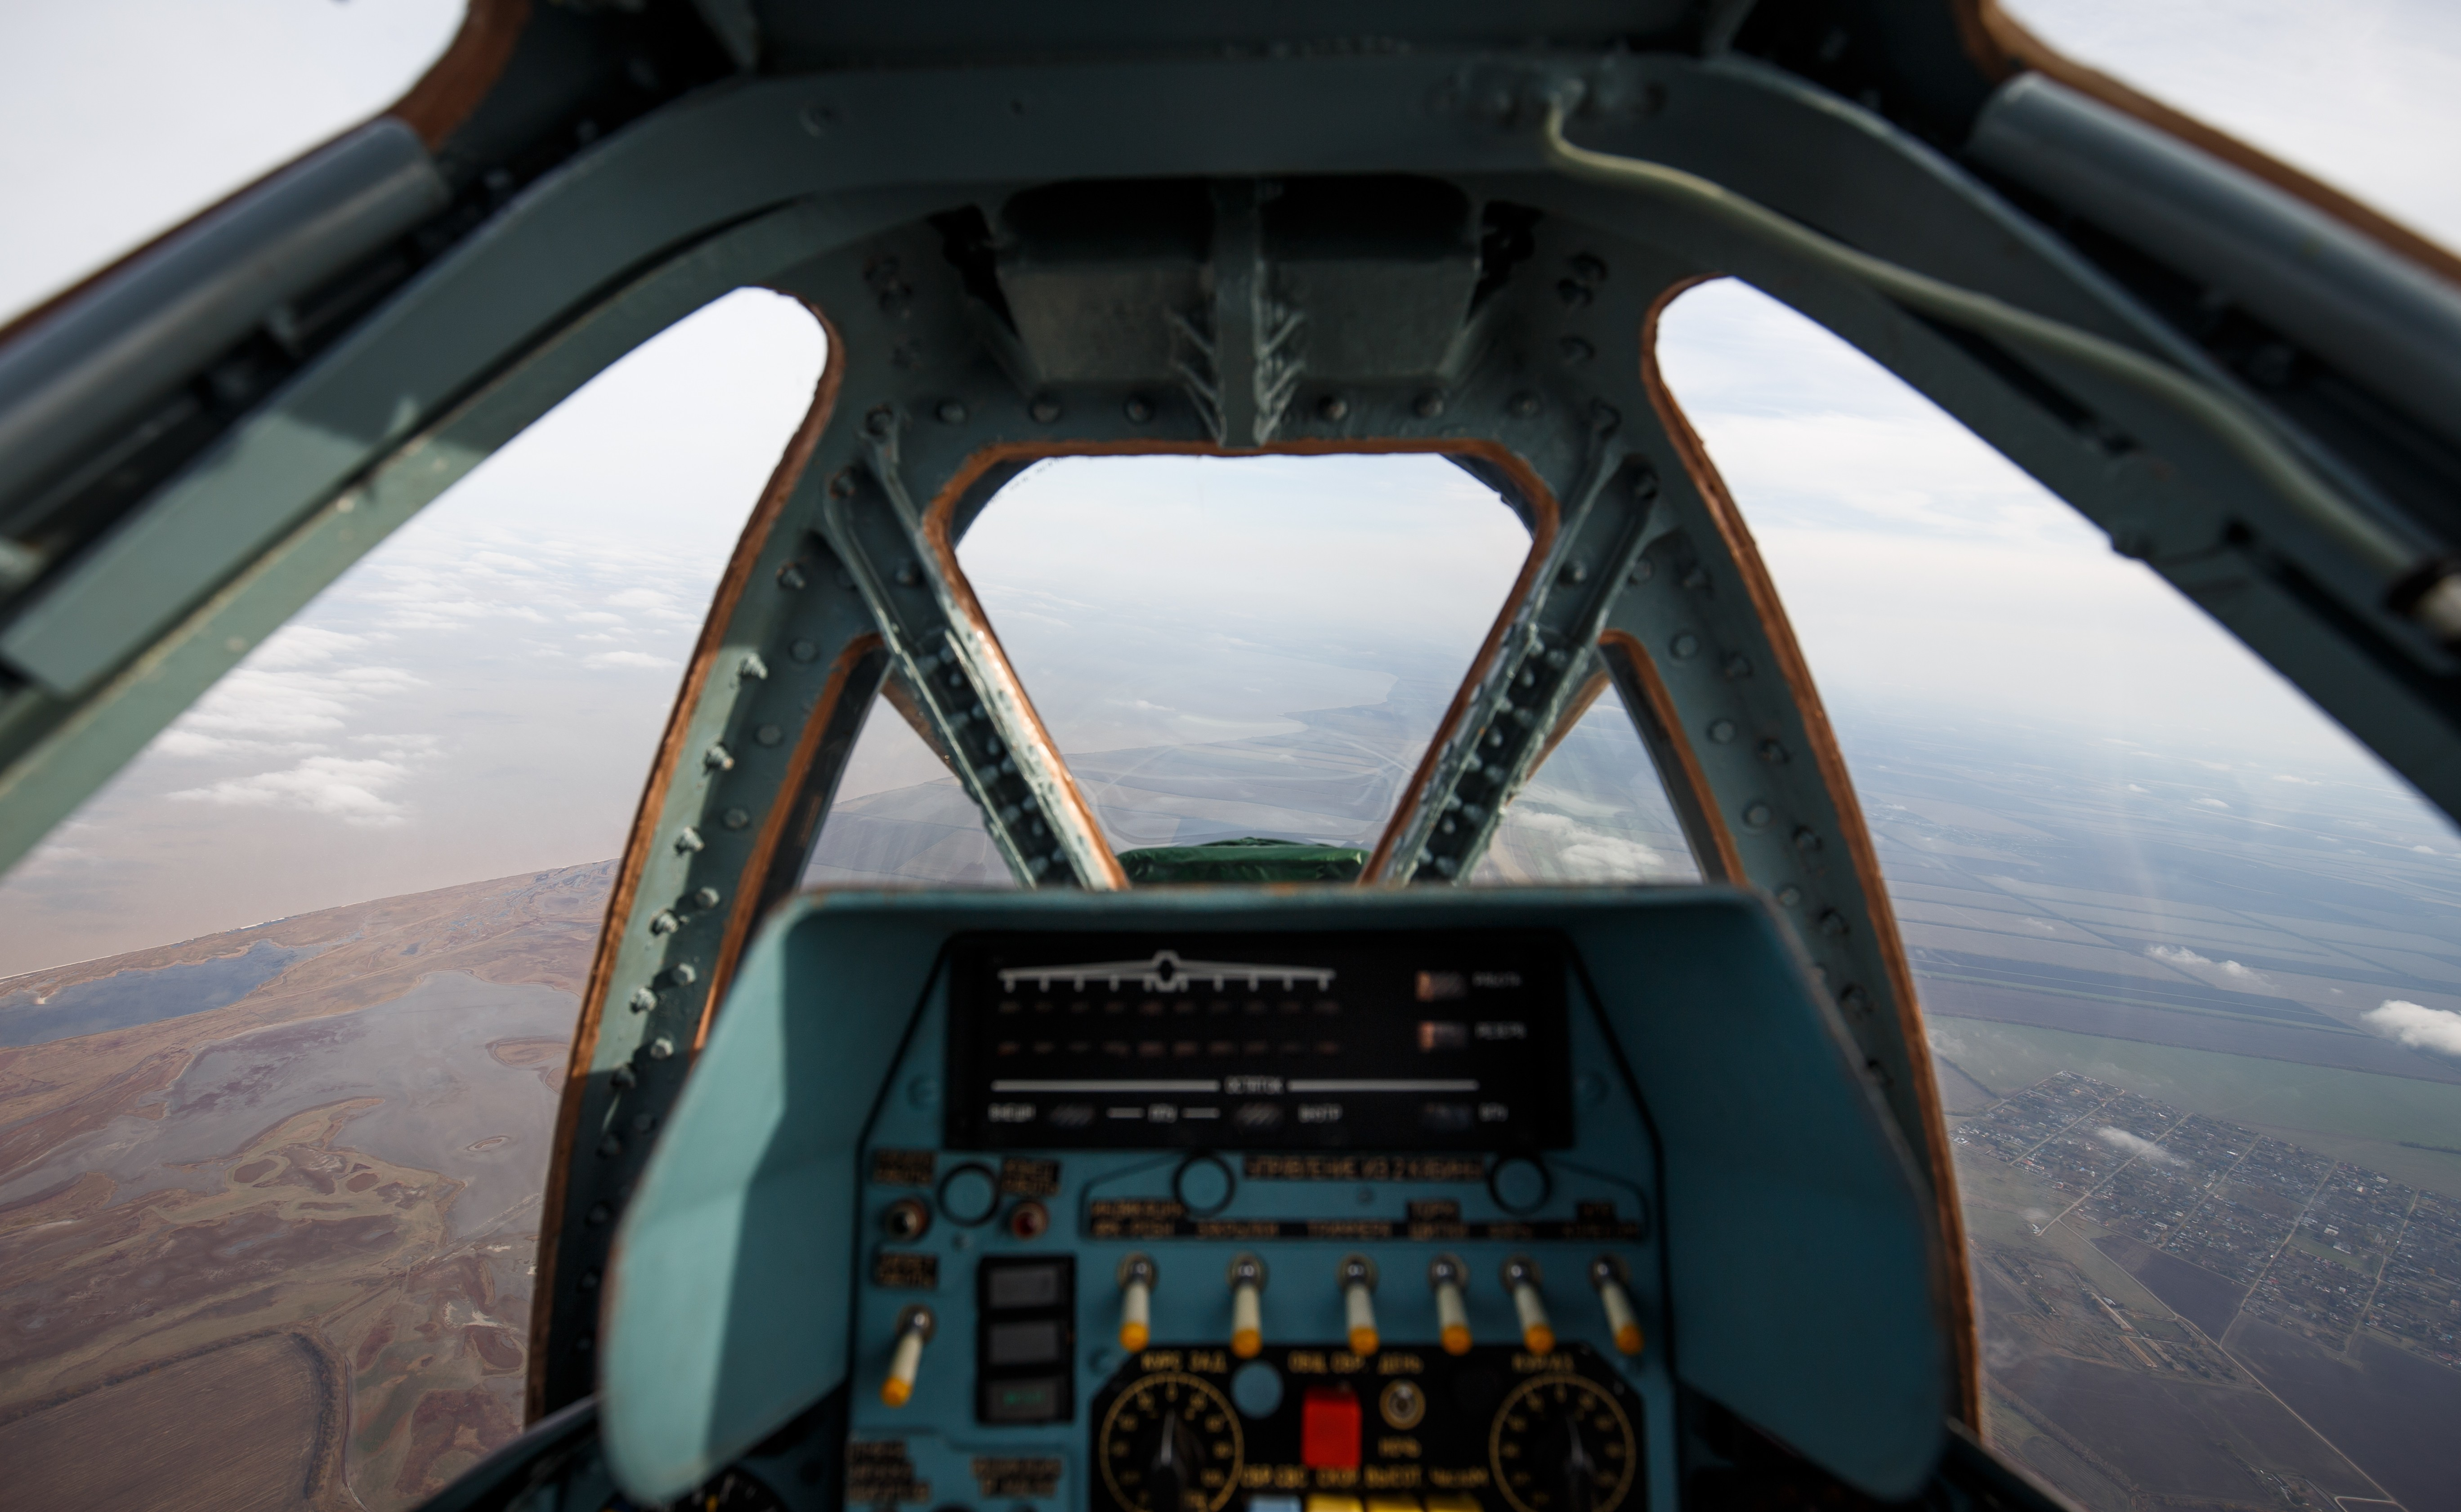 <p>Вид из кабины штурмовика Су-25</p> <p><span>Фото:&nbsp;</span><span>&copy;&nbsp;</span><span>РИА Новости/</span>Виталий Тимкив</p>